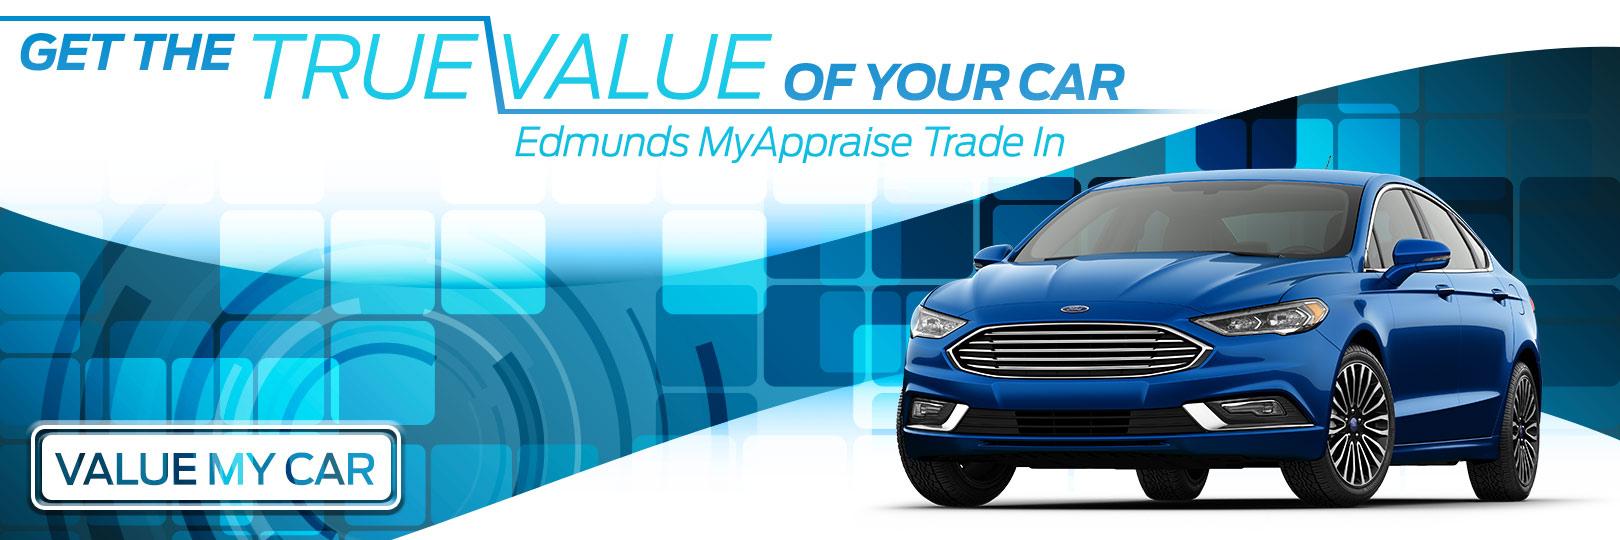 Edmunds used car value calculator vase and used car restimages. Org.